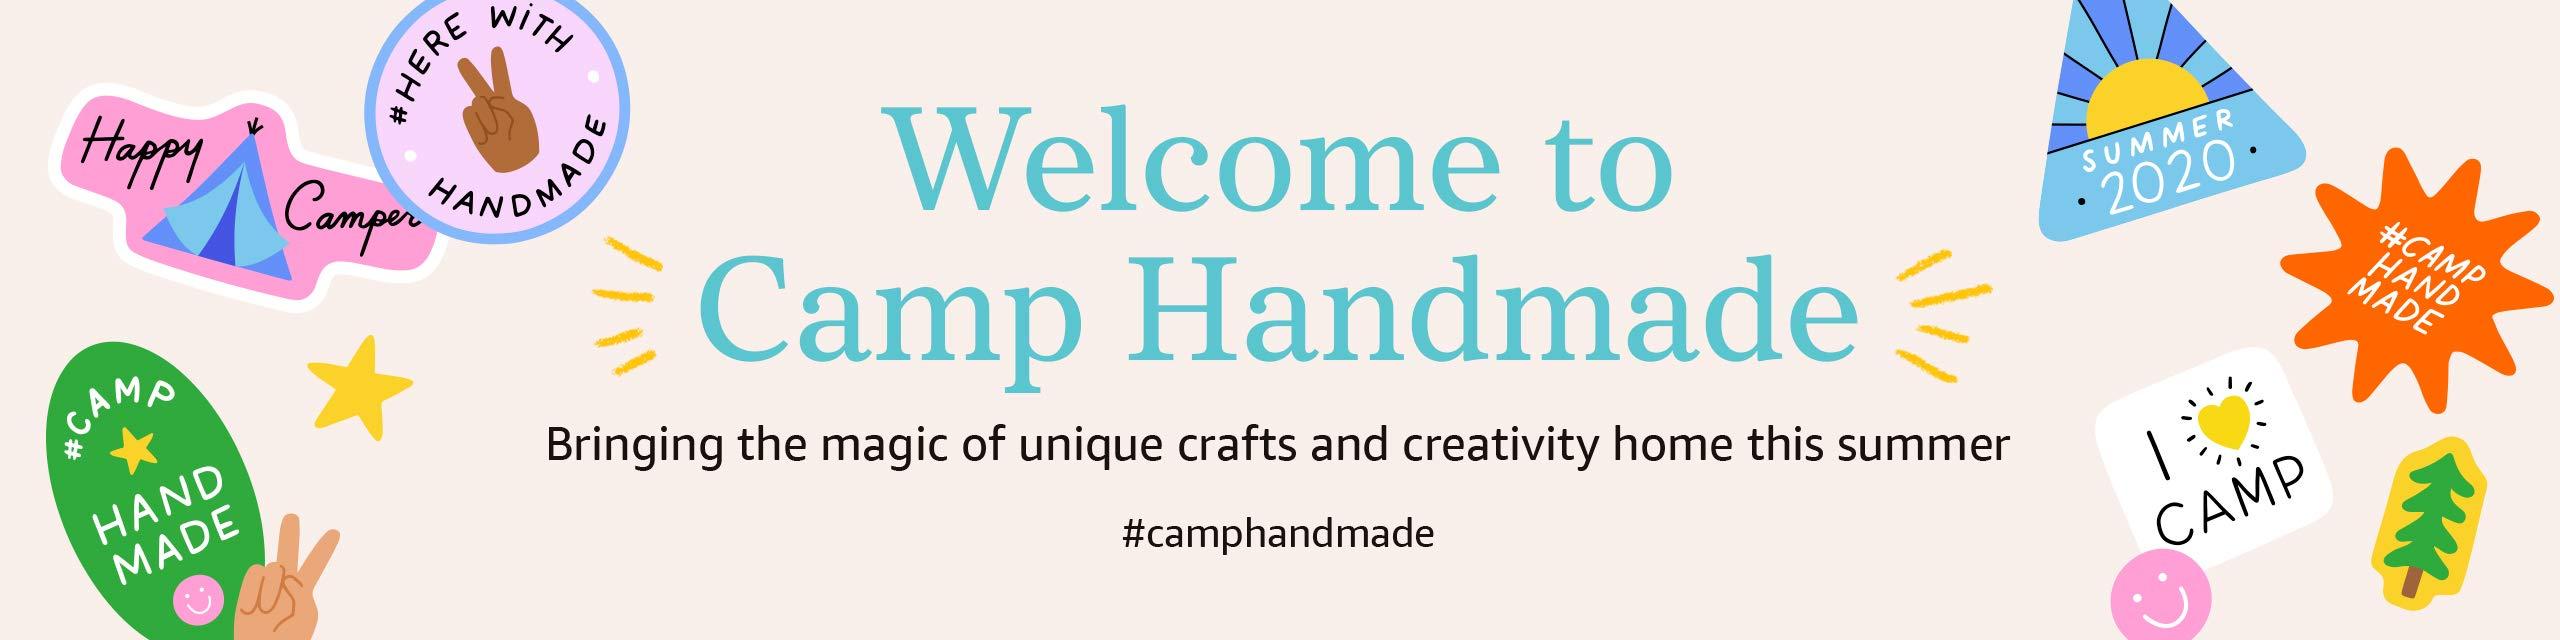 Welcome to Camp Handmade